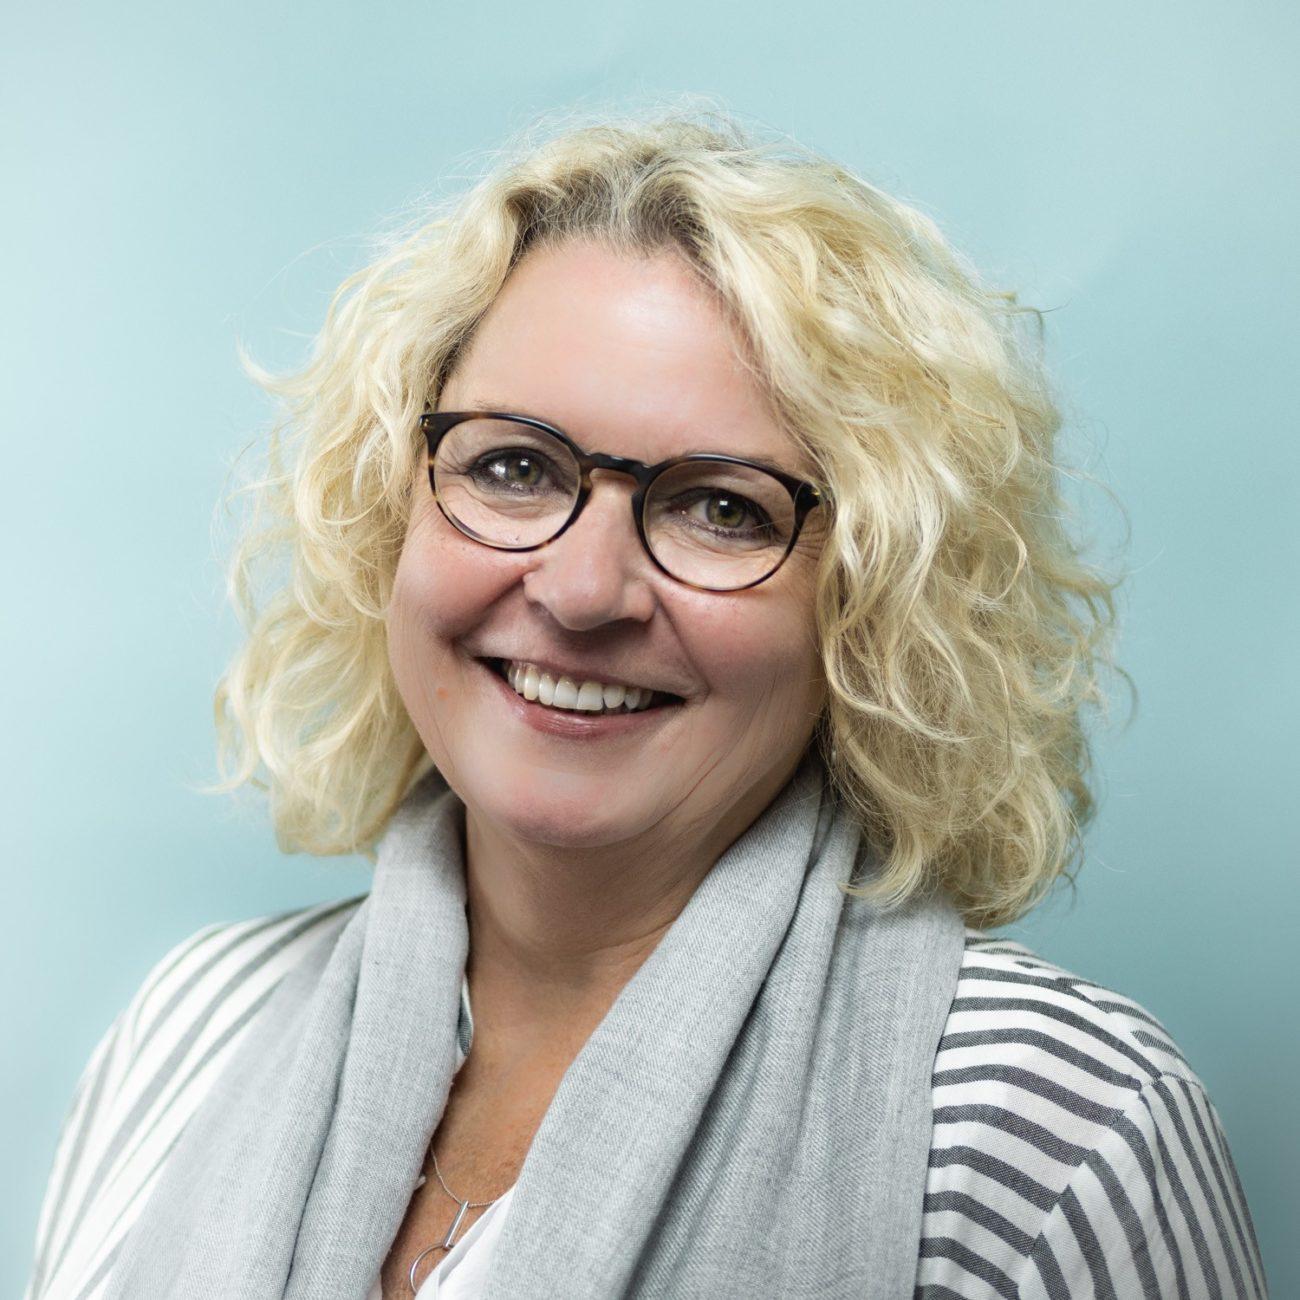 Ute Birgit Obering